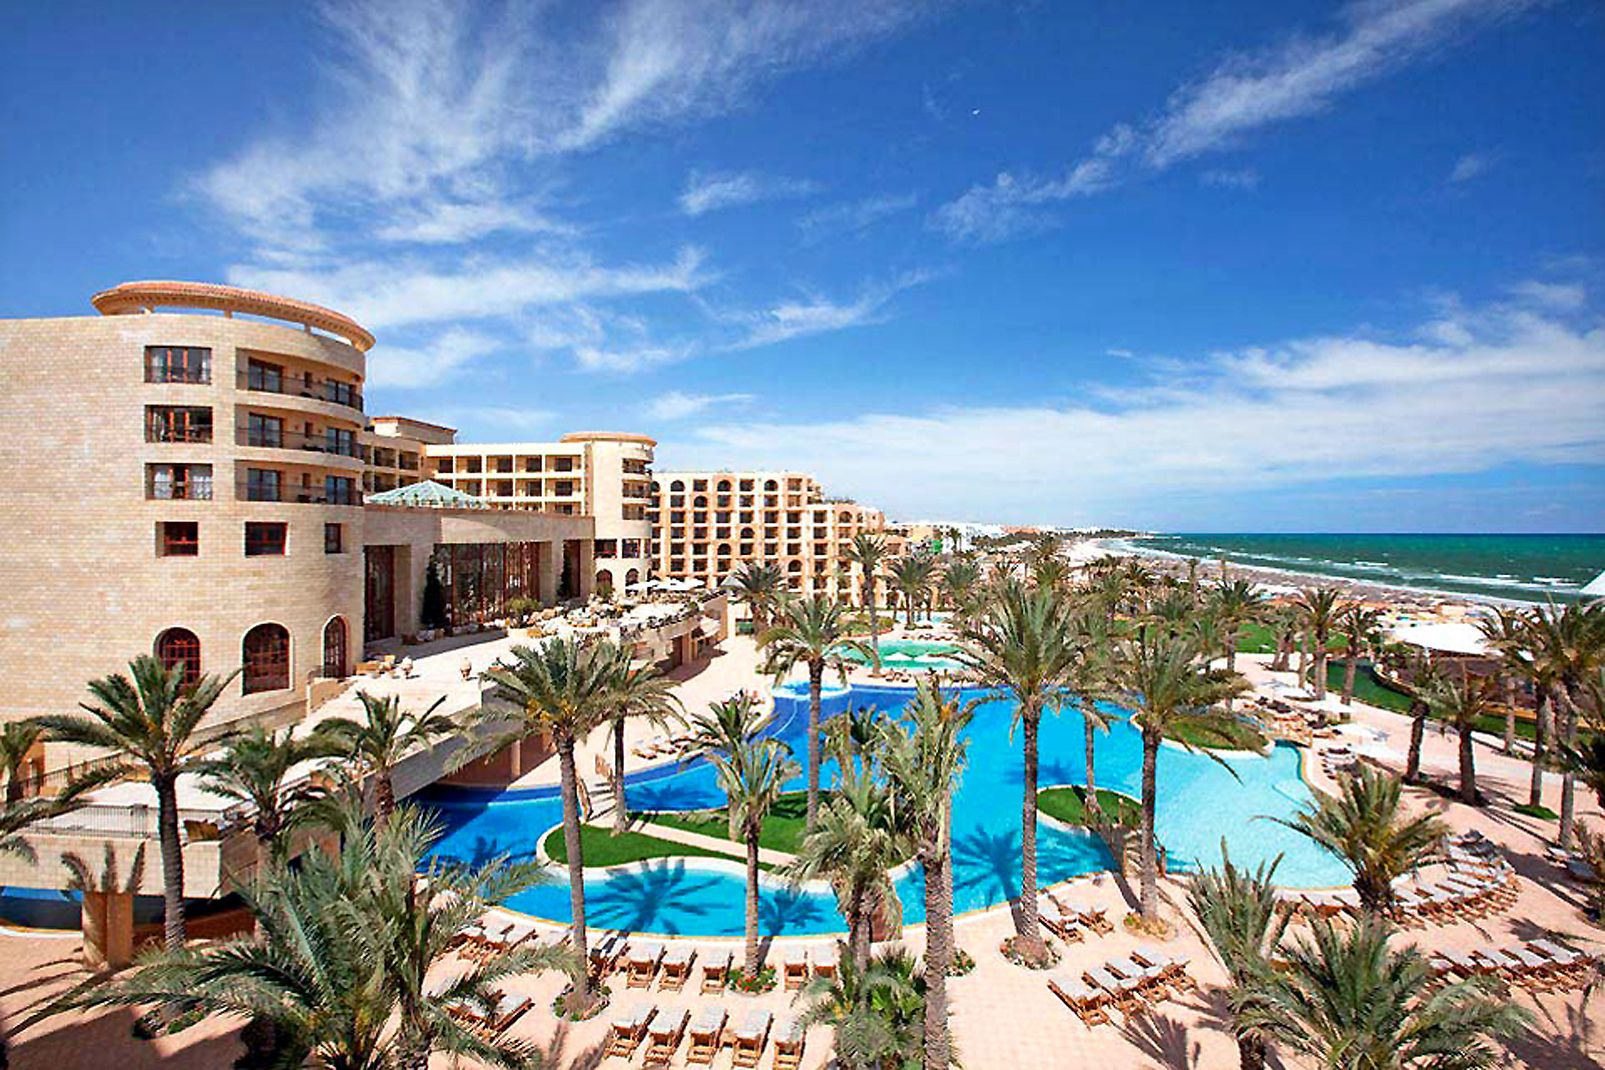 Hôtel Movenpick Resort Marine & Spa 5 * - 1